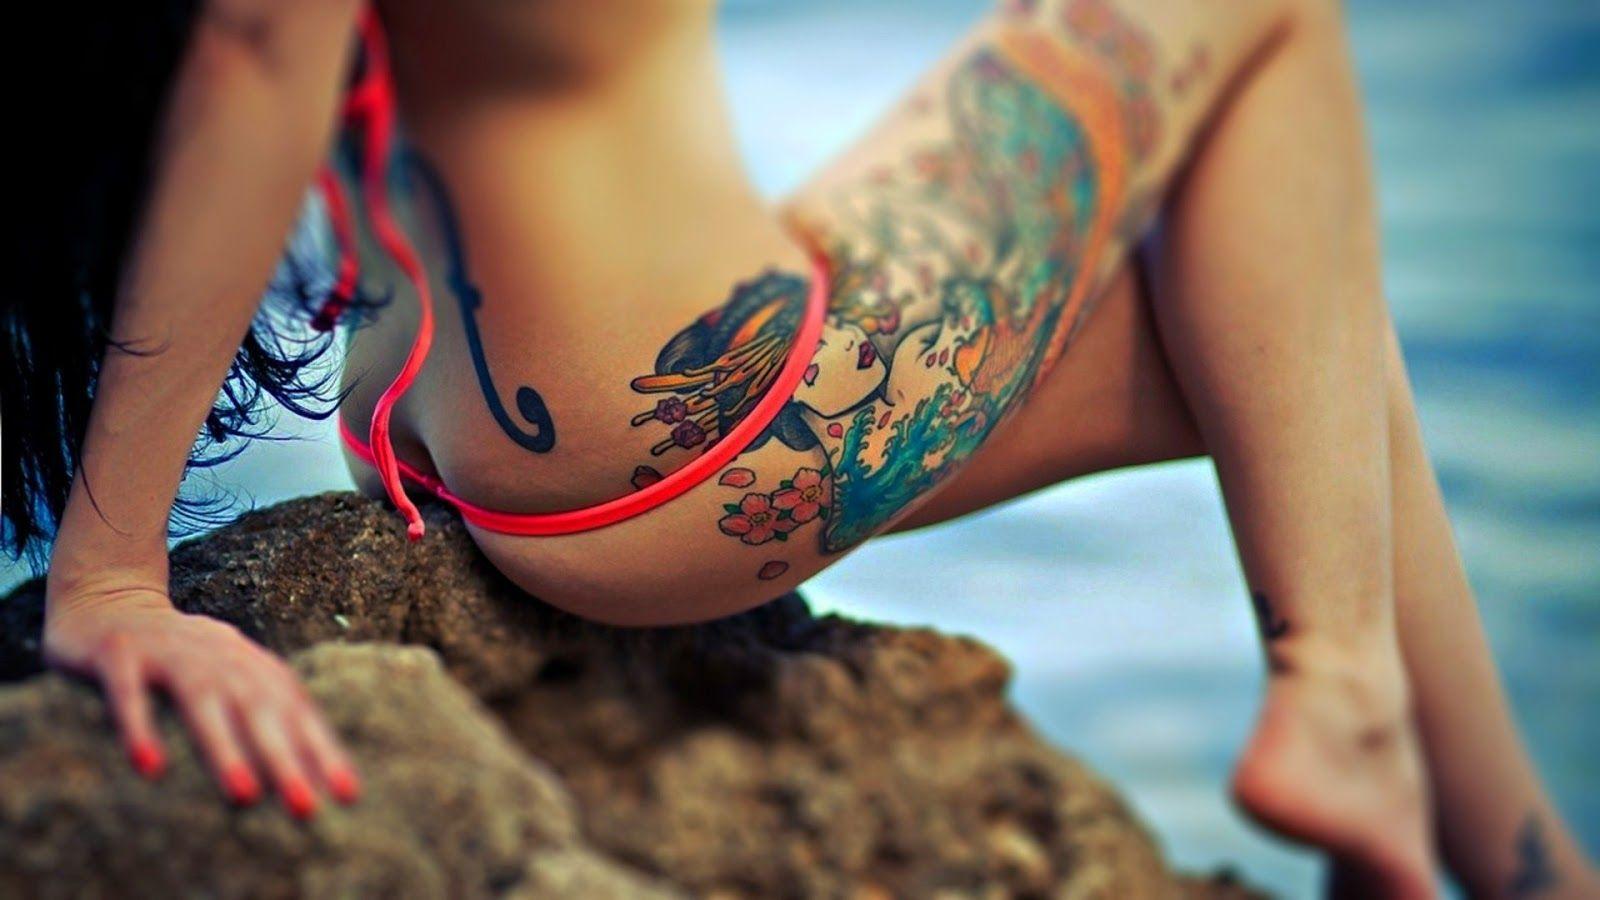 Sexy tattoo girl wallpaper